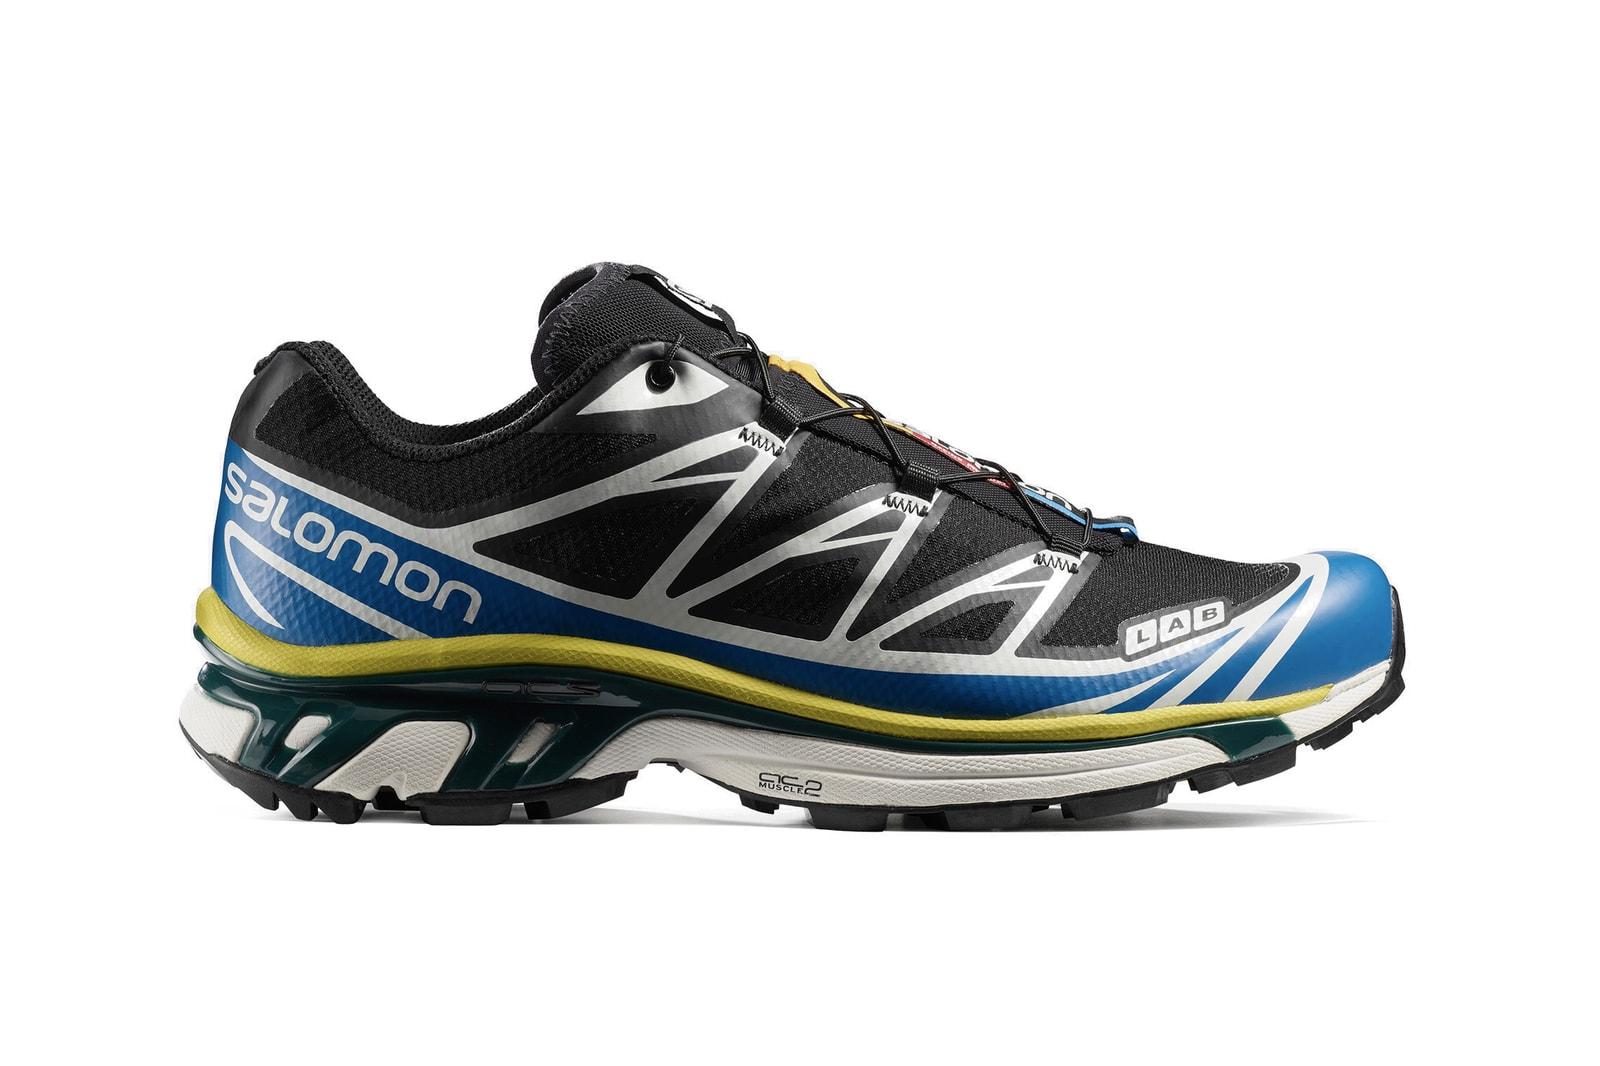 Best Women's Technical Outerwear Brands Snow Peak Arc'Teryx Nike ACG Columbia Salomon Sneakers Hiking Boots Gore-Tex Jacket